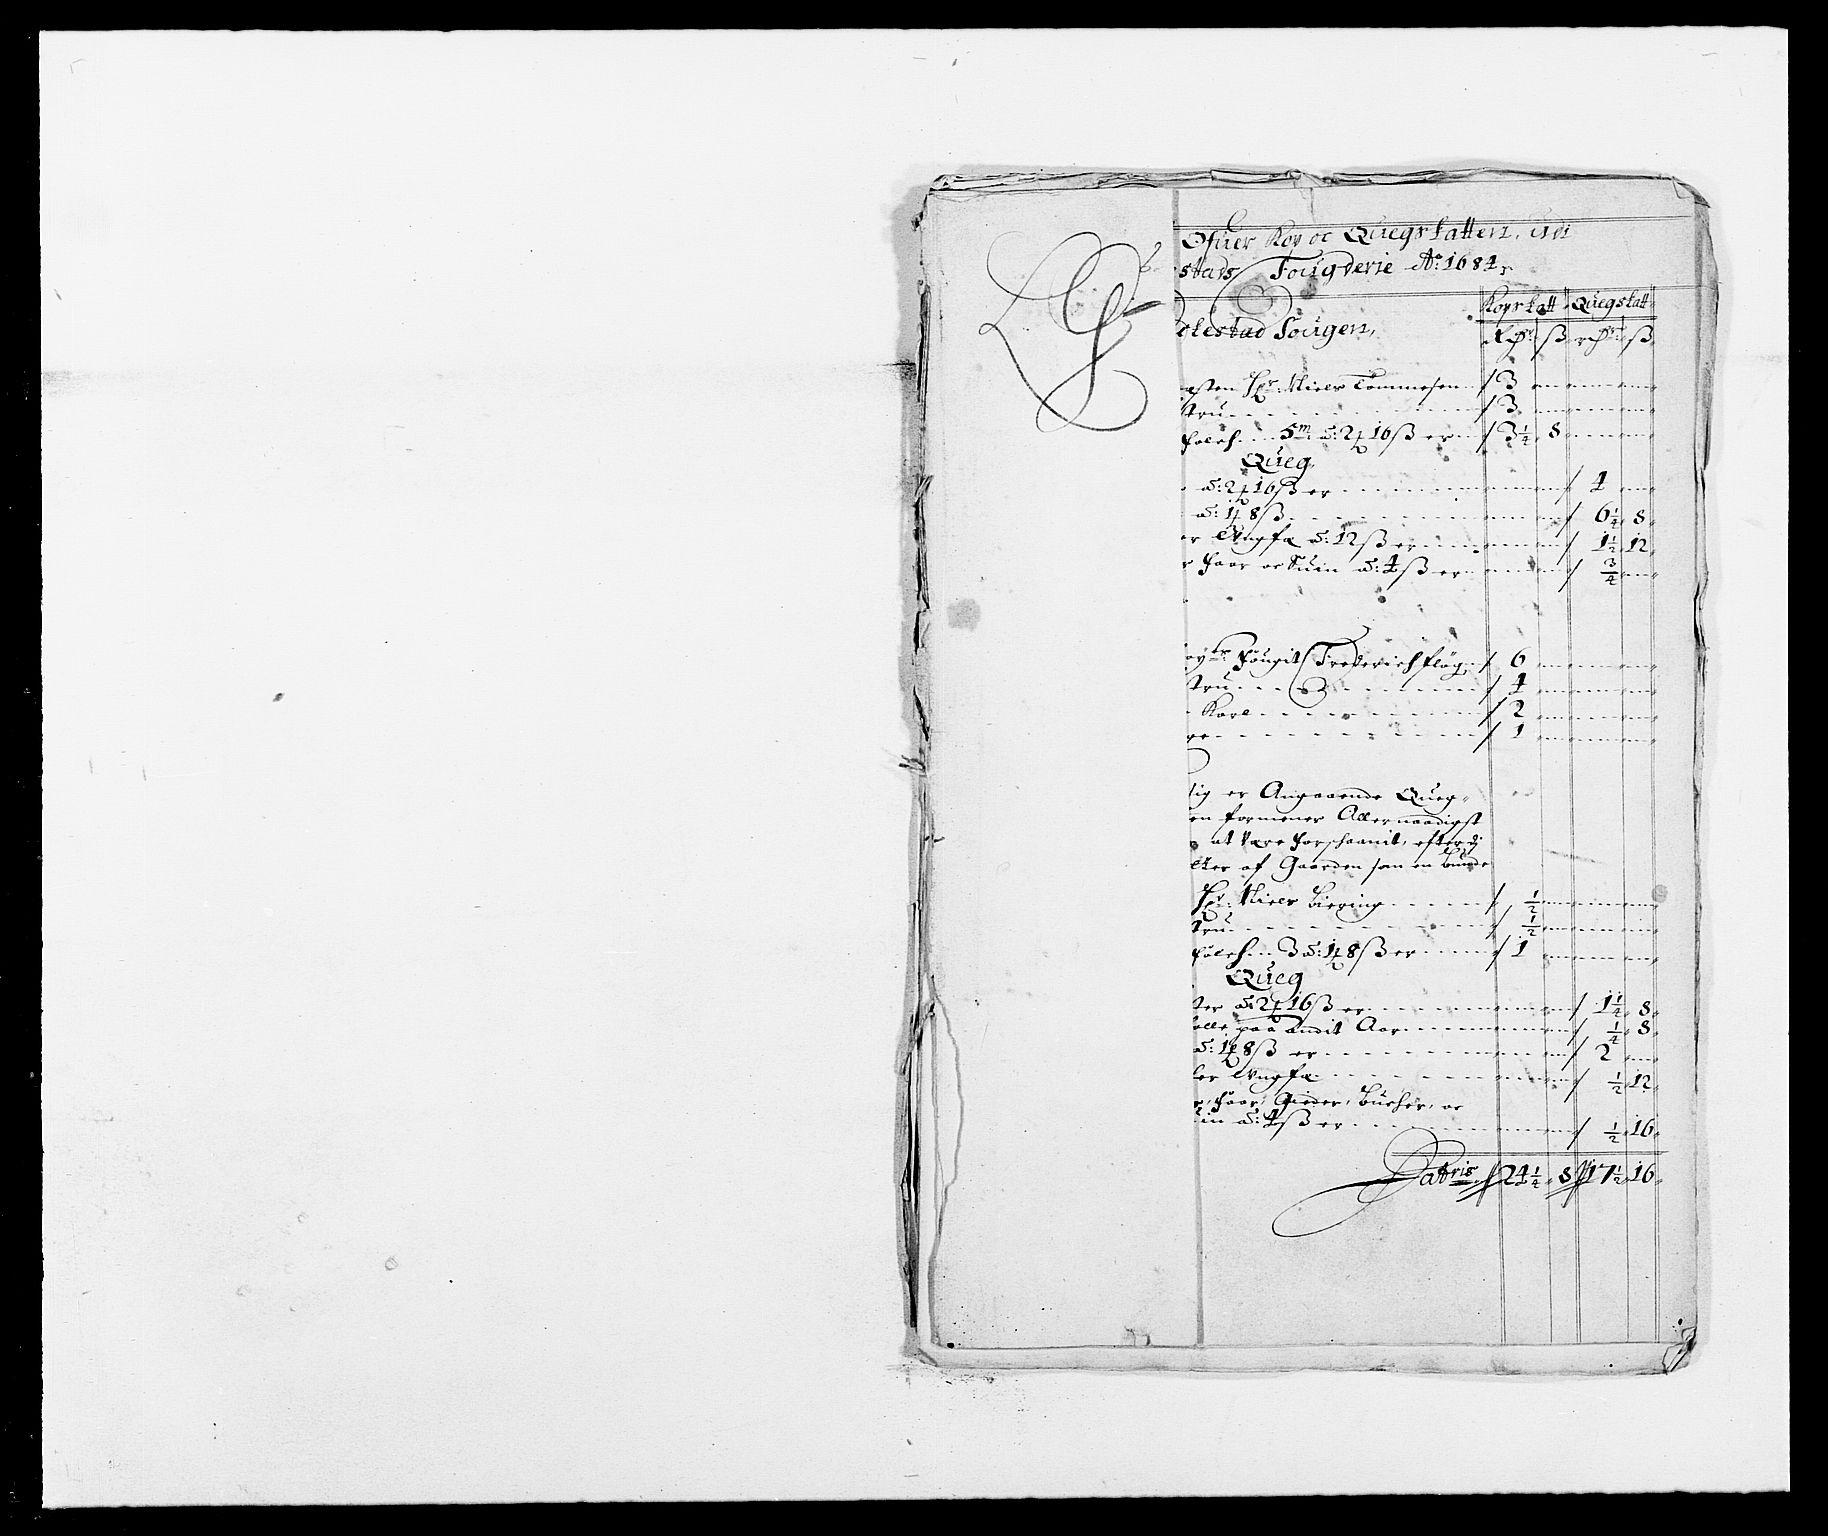 RA, Rentekammeret inntil 1814, Reviderte regnskaper, Fogderegnskap, R05/L0274: Fogderegnskap Rakkestad, 1683-1684, s. 373